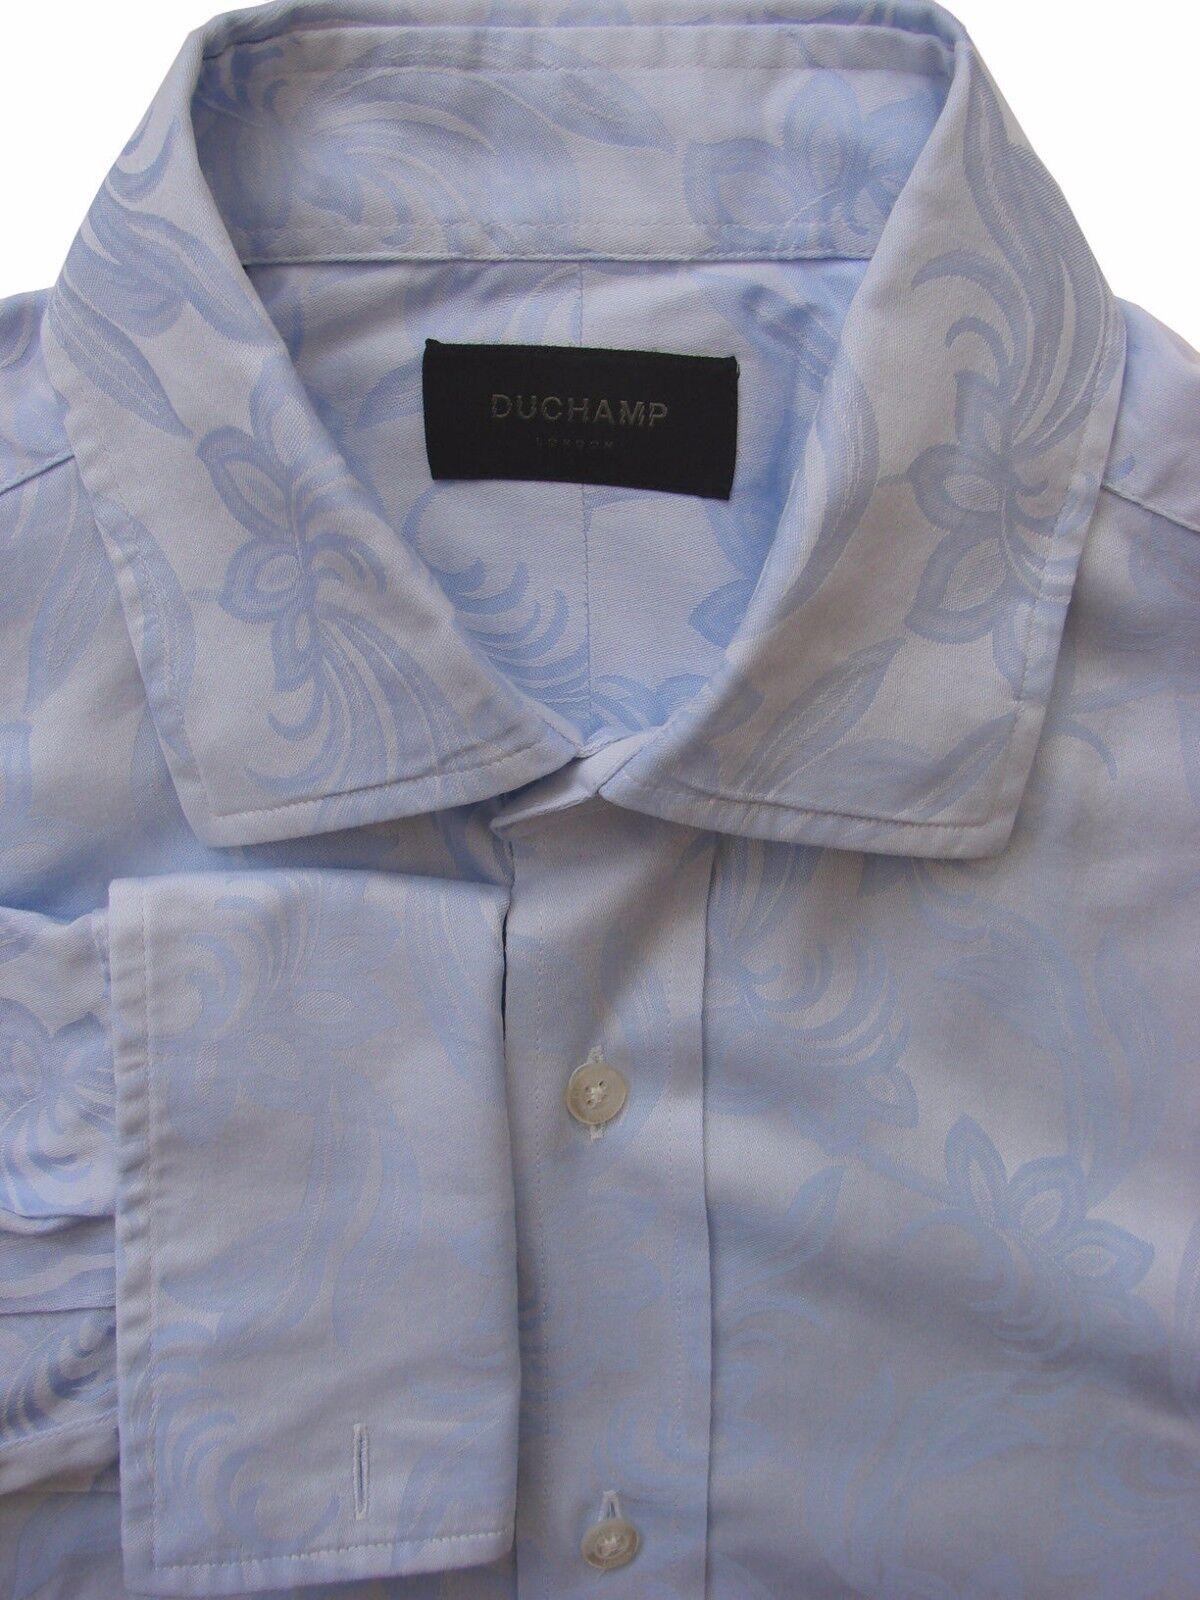 Duchamp London Camicia Blu da Uomo 16 M-fiori